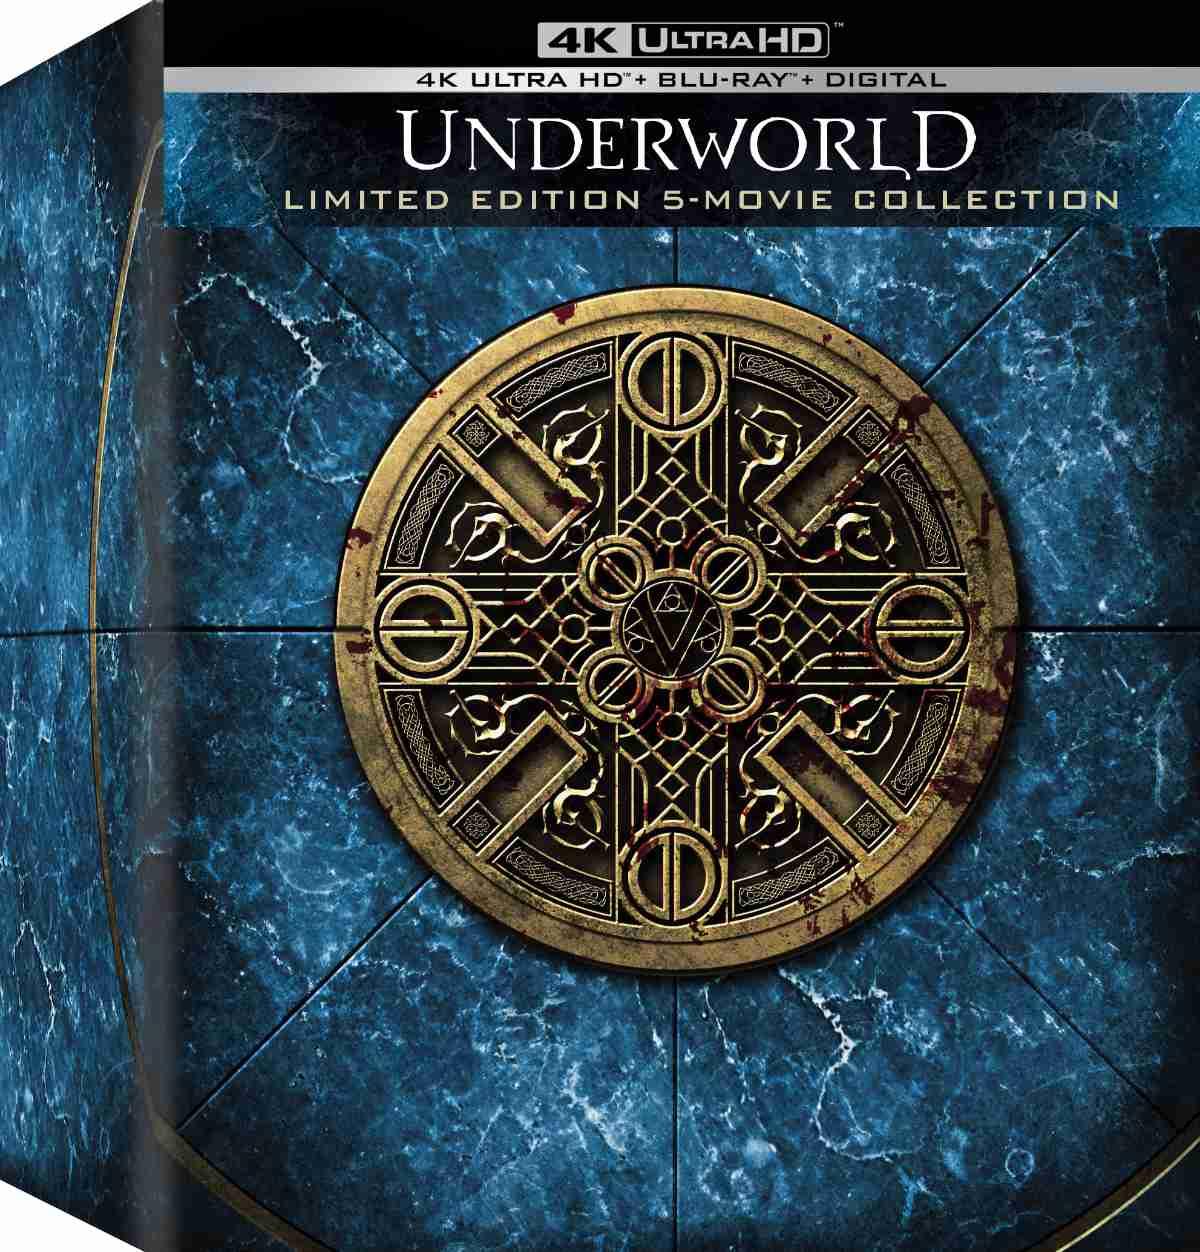 Underworld 4K Ultra HD Collection